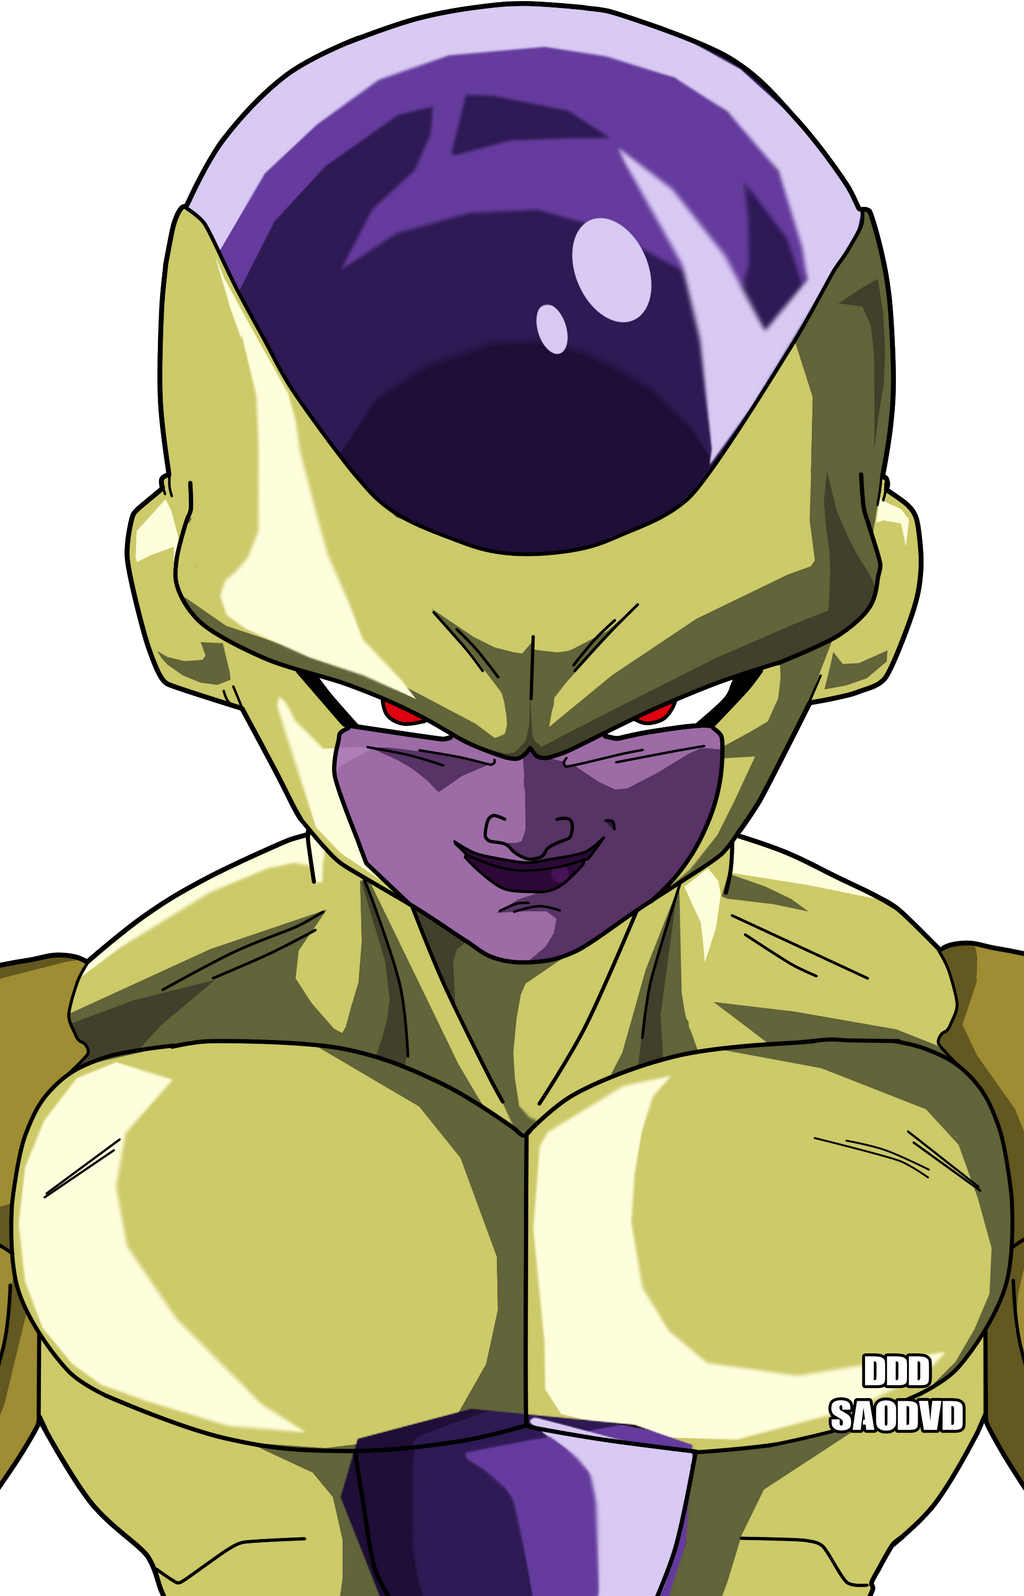 DragonBall Ki Ball 2 593830720 also Trunks in addition Goku Ultra Instinct Transforming Transformation Gif 10255918 moreover 333274 Dragon Ball Z Transparent Gif besides Golden Freezer Gold Frieza 524459032. on goku thumbs up